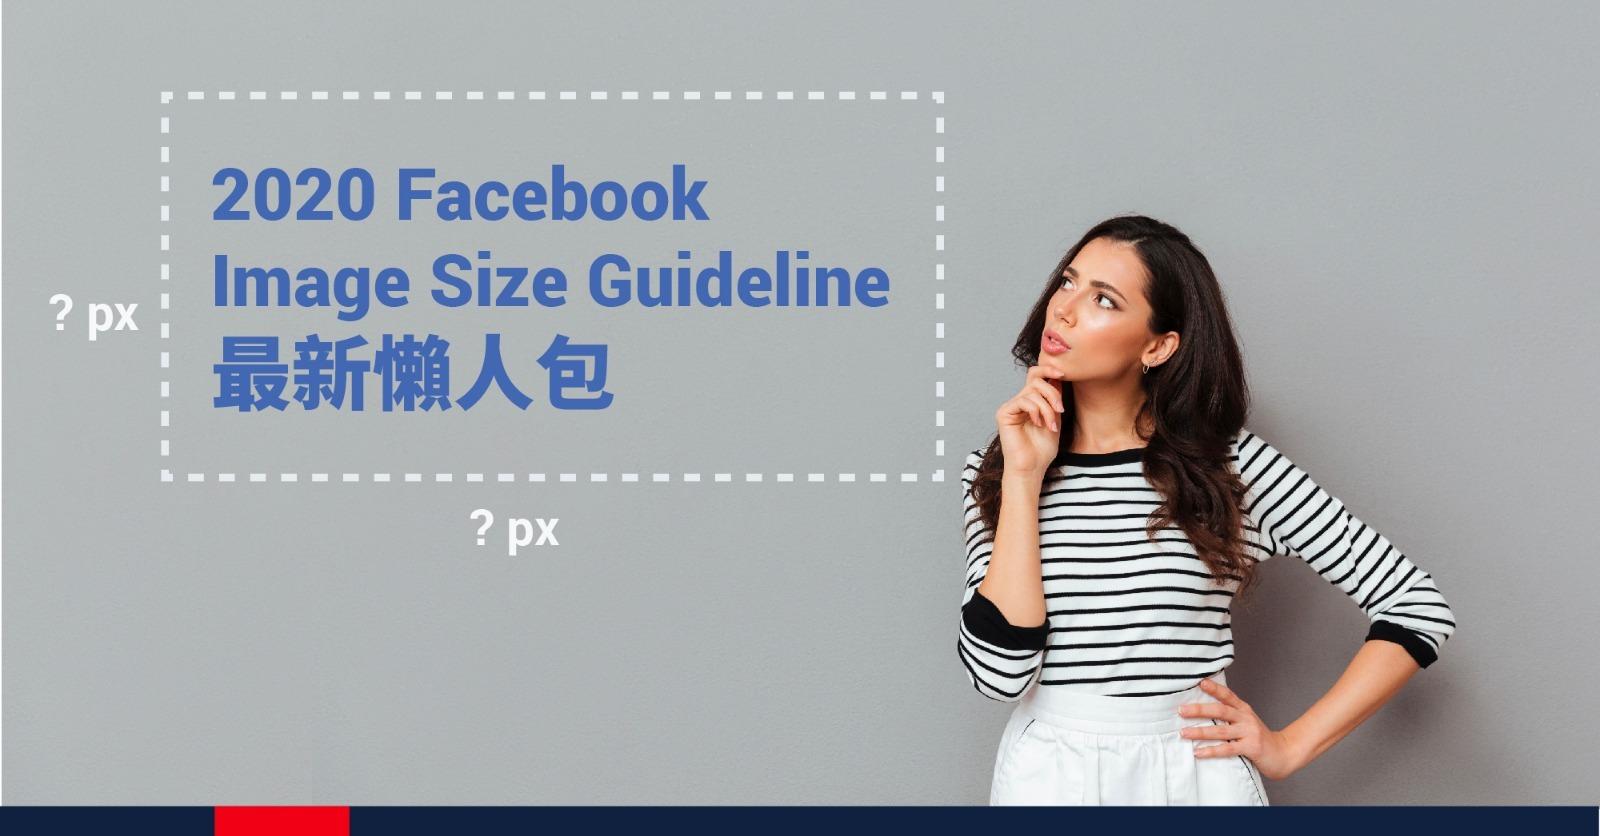 Facebook Image Size Guideline